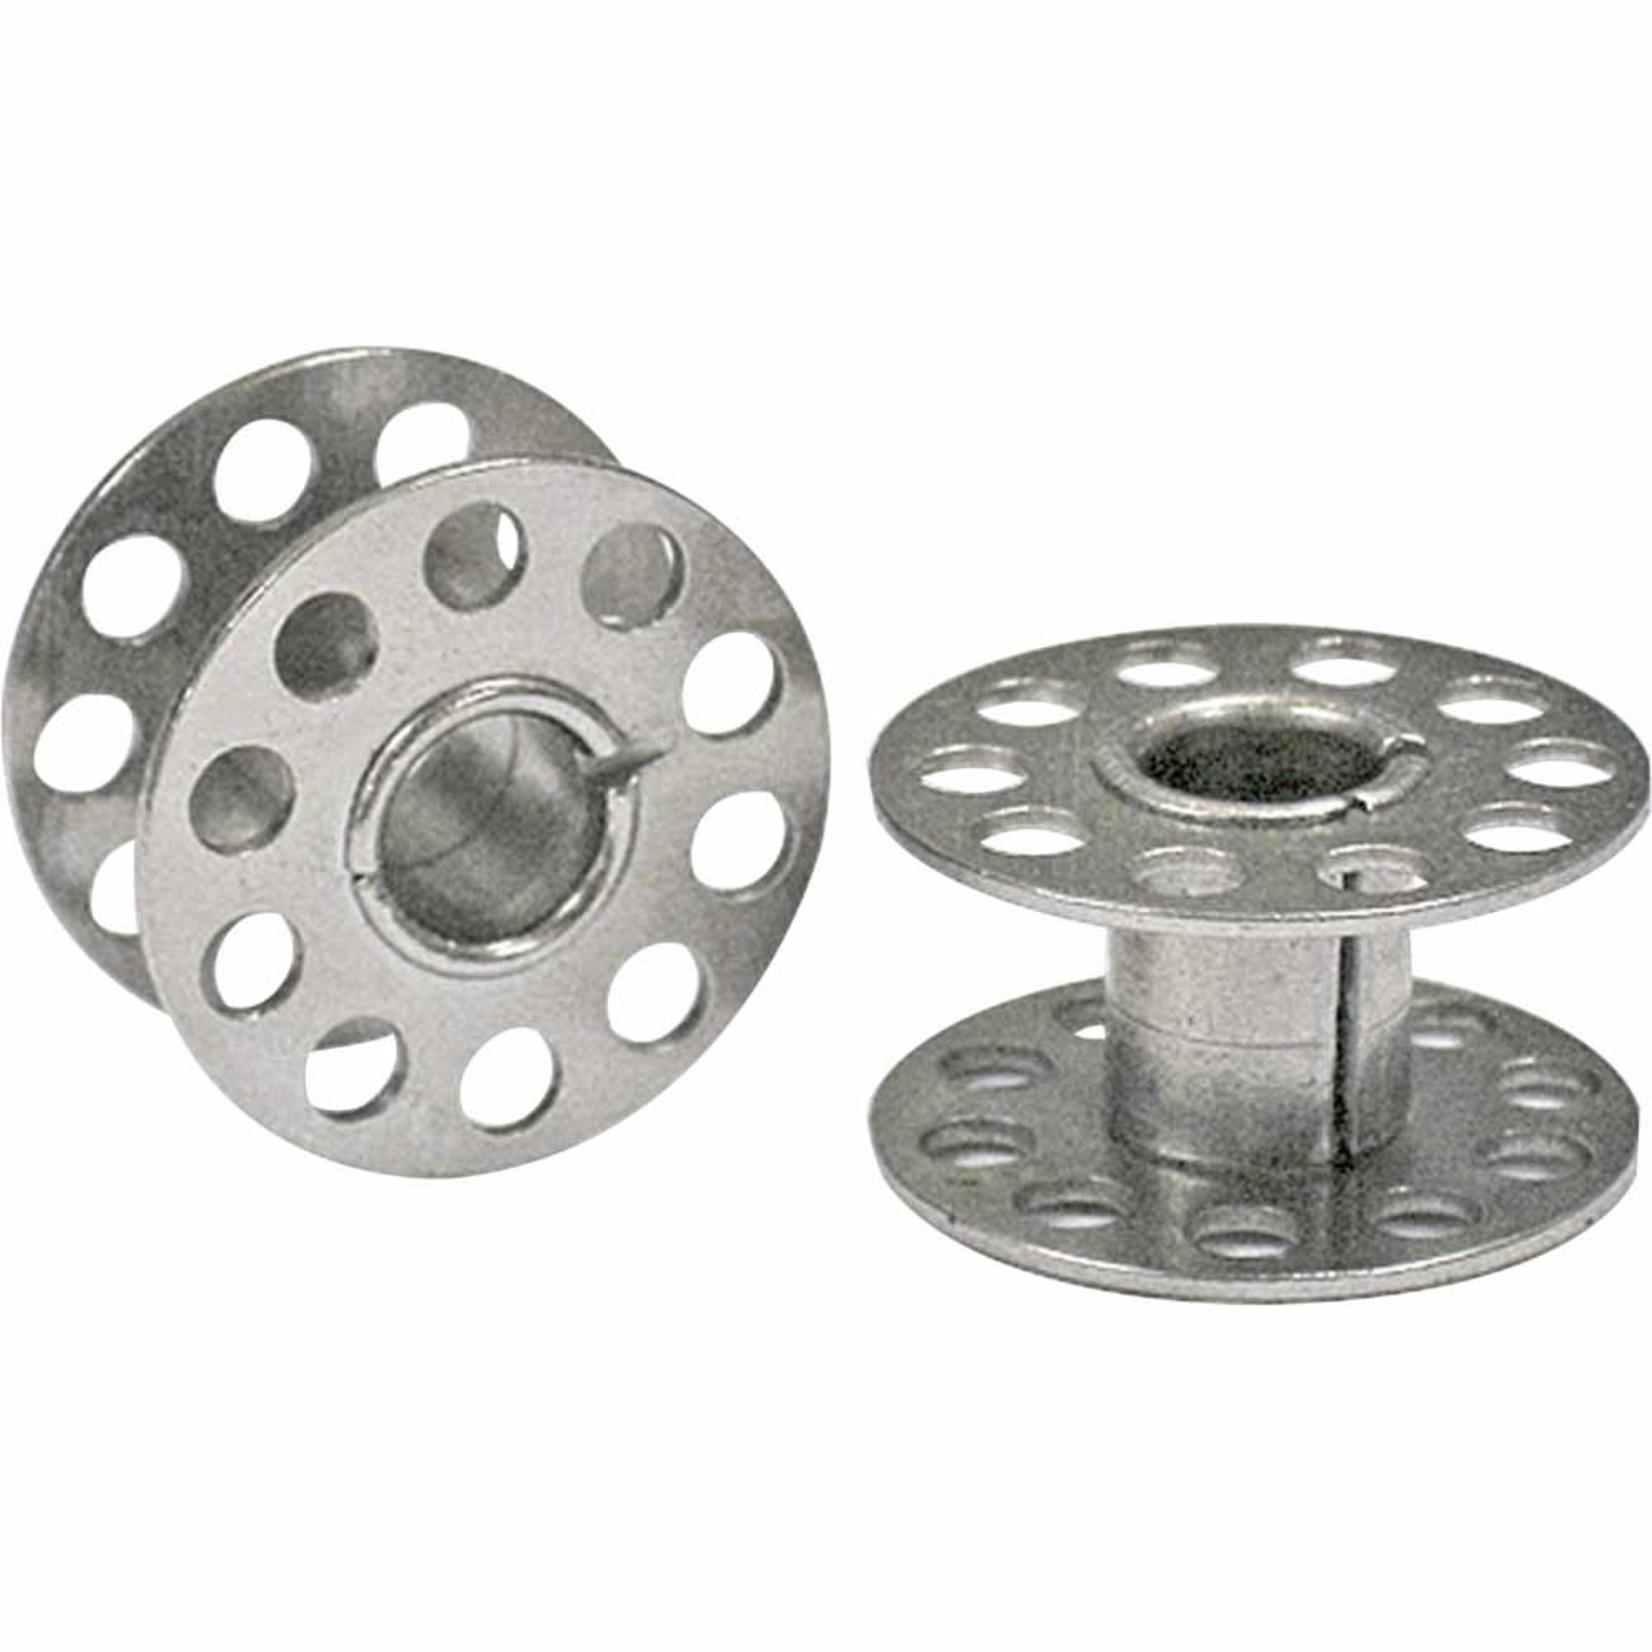 Metal bobin 10 holes